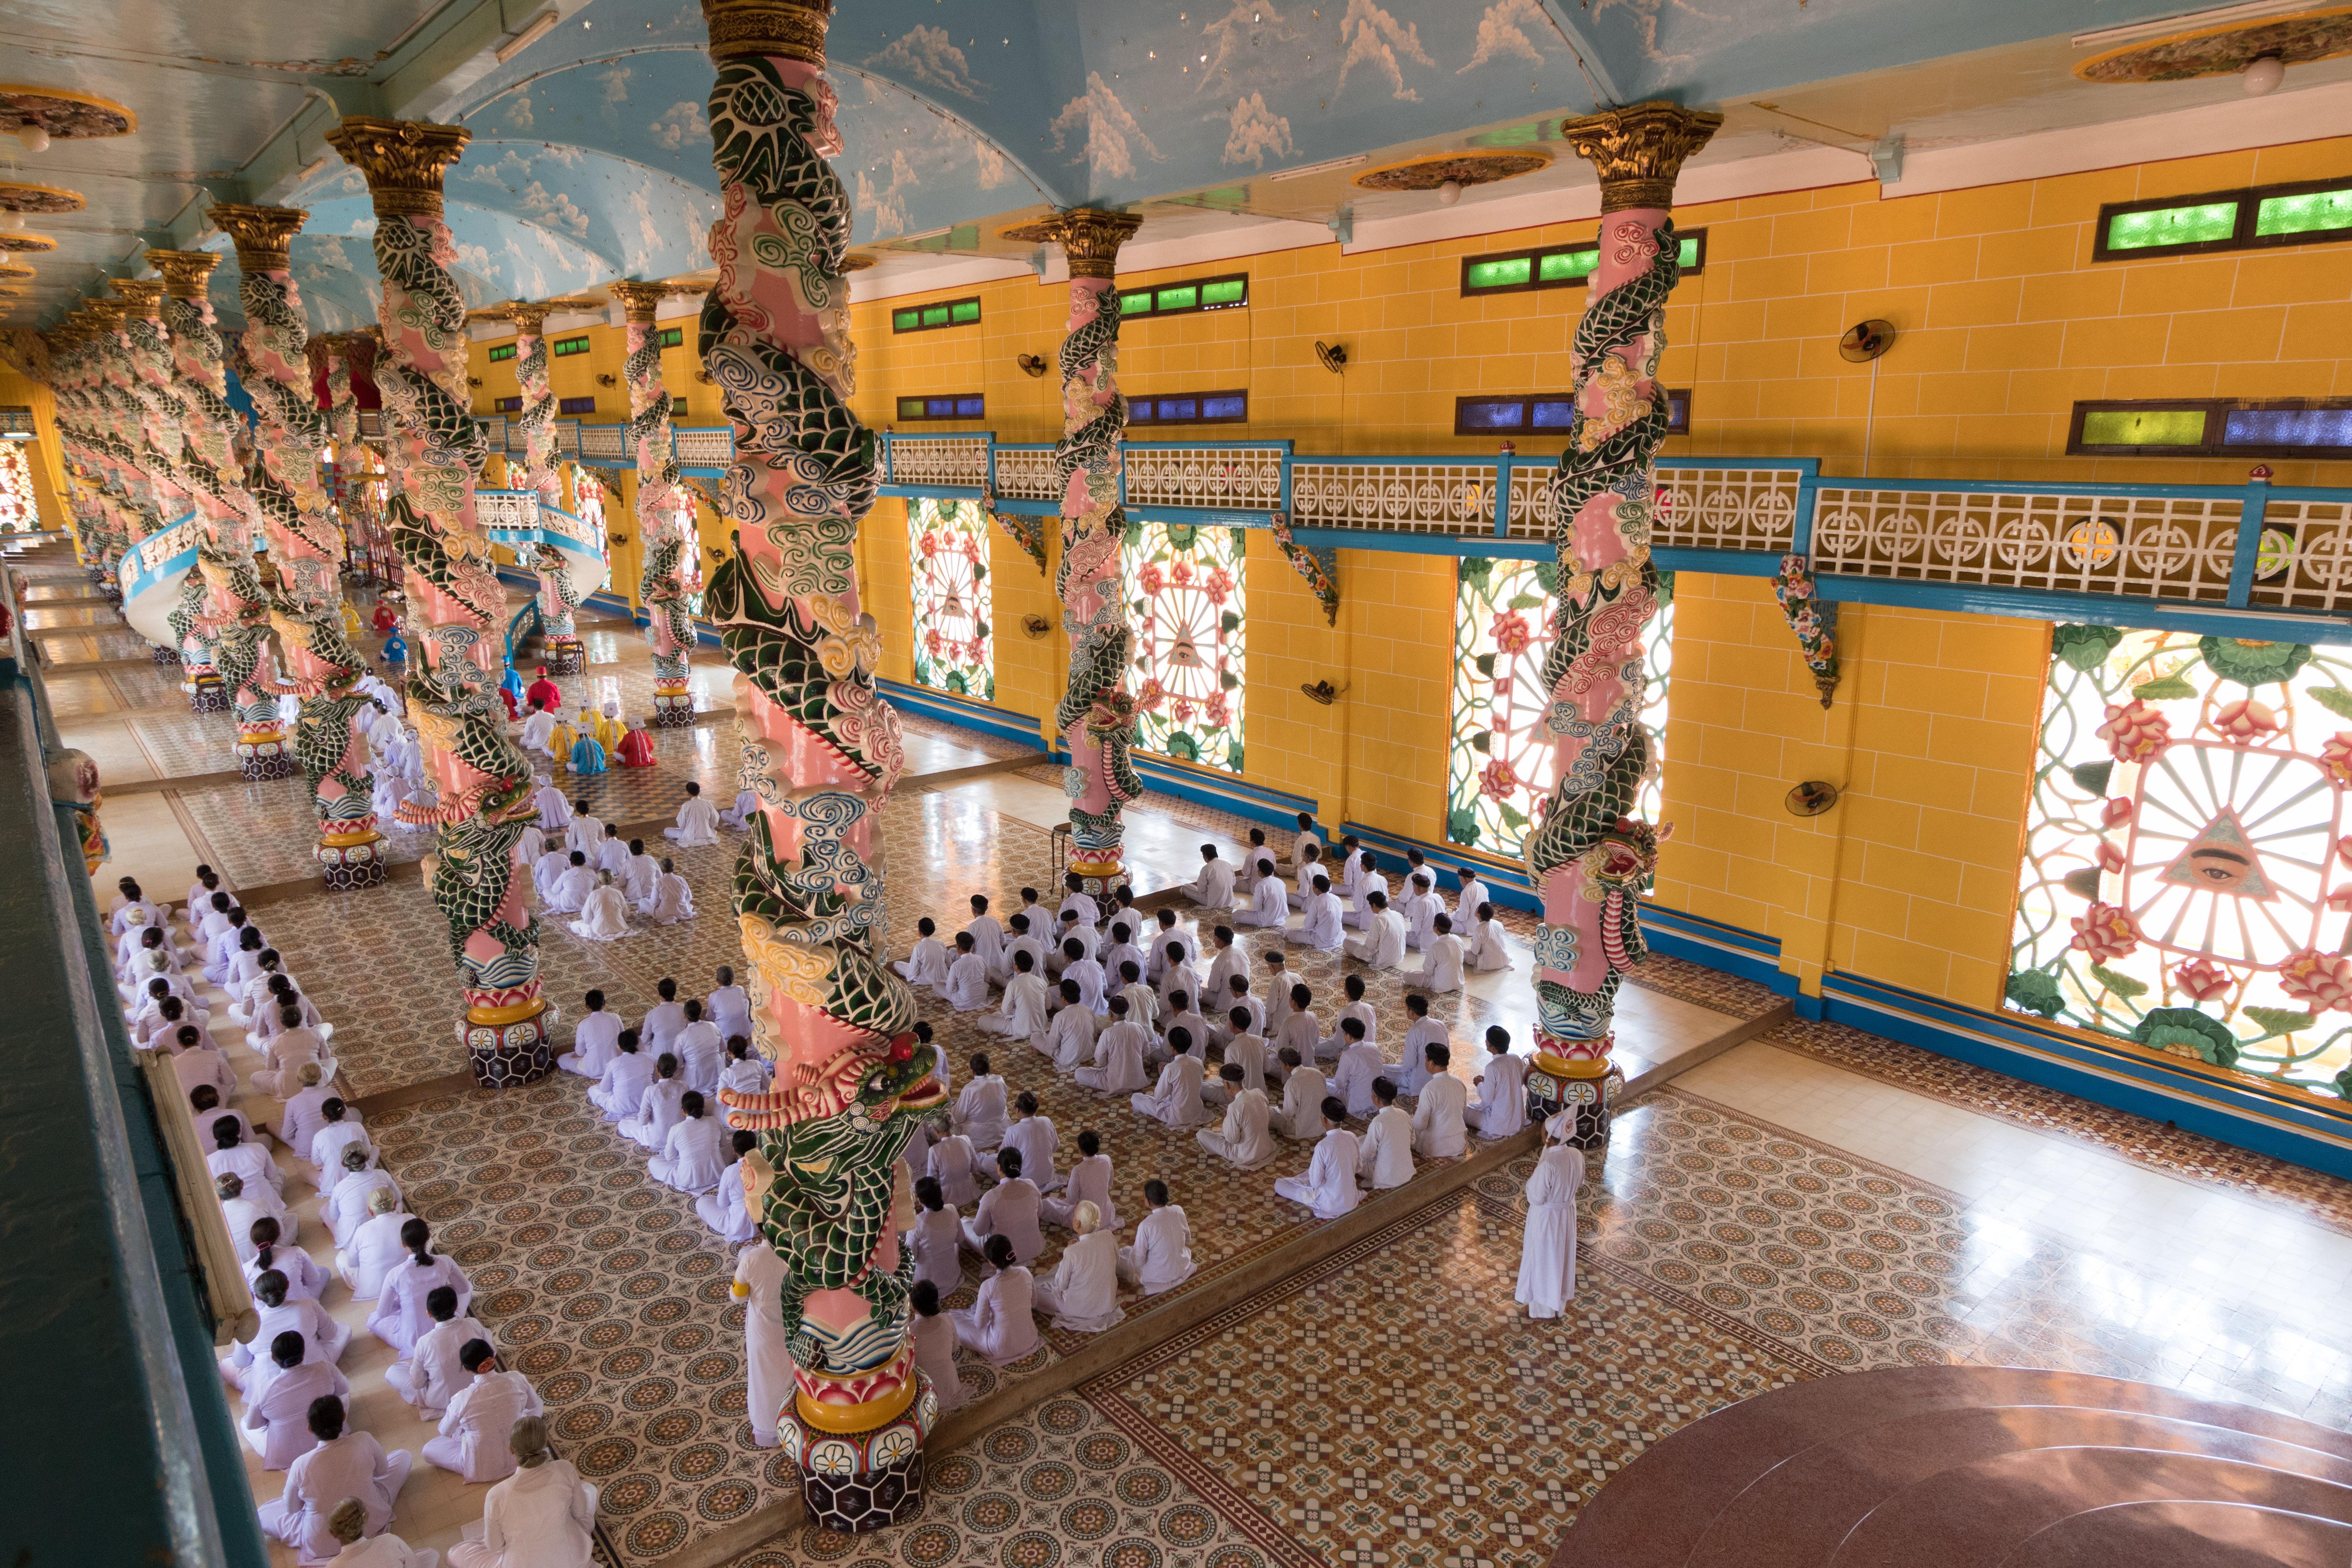 Yvonderweg - Hallo Ho Chi Minh! - Heilige Stoel van Cao Dai binnen